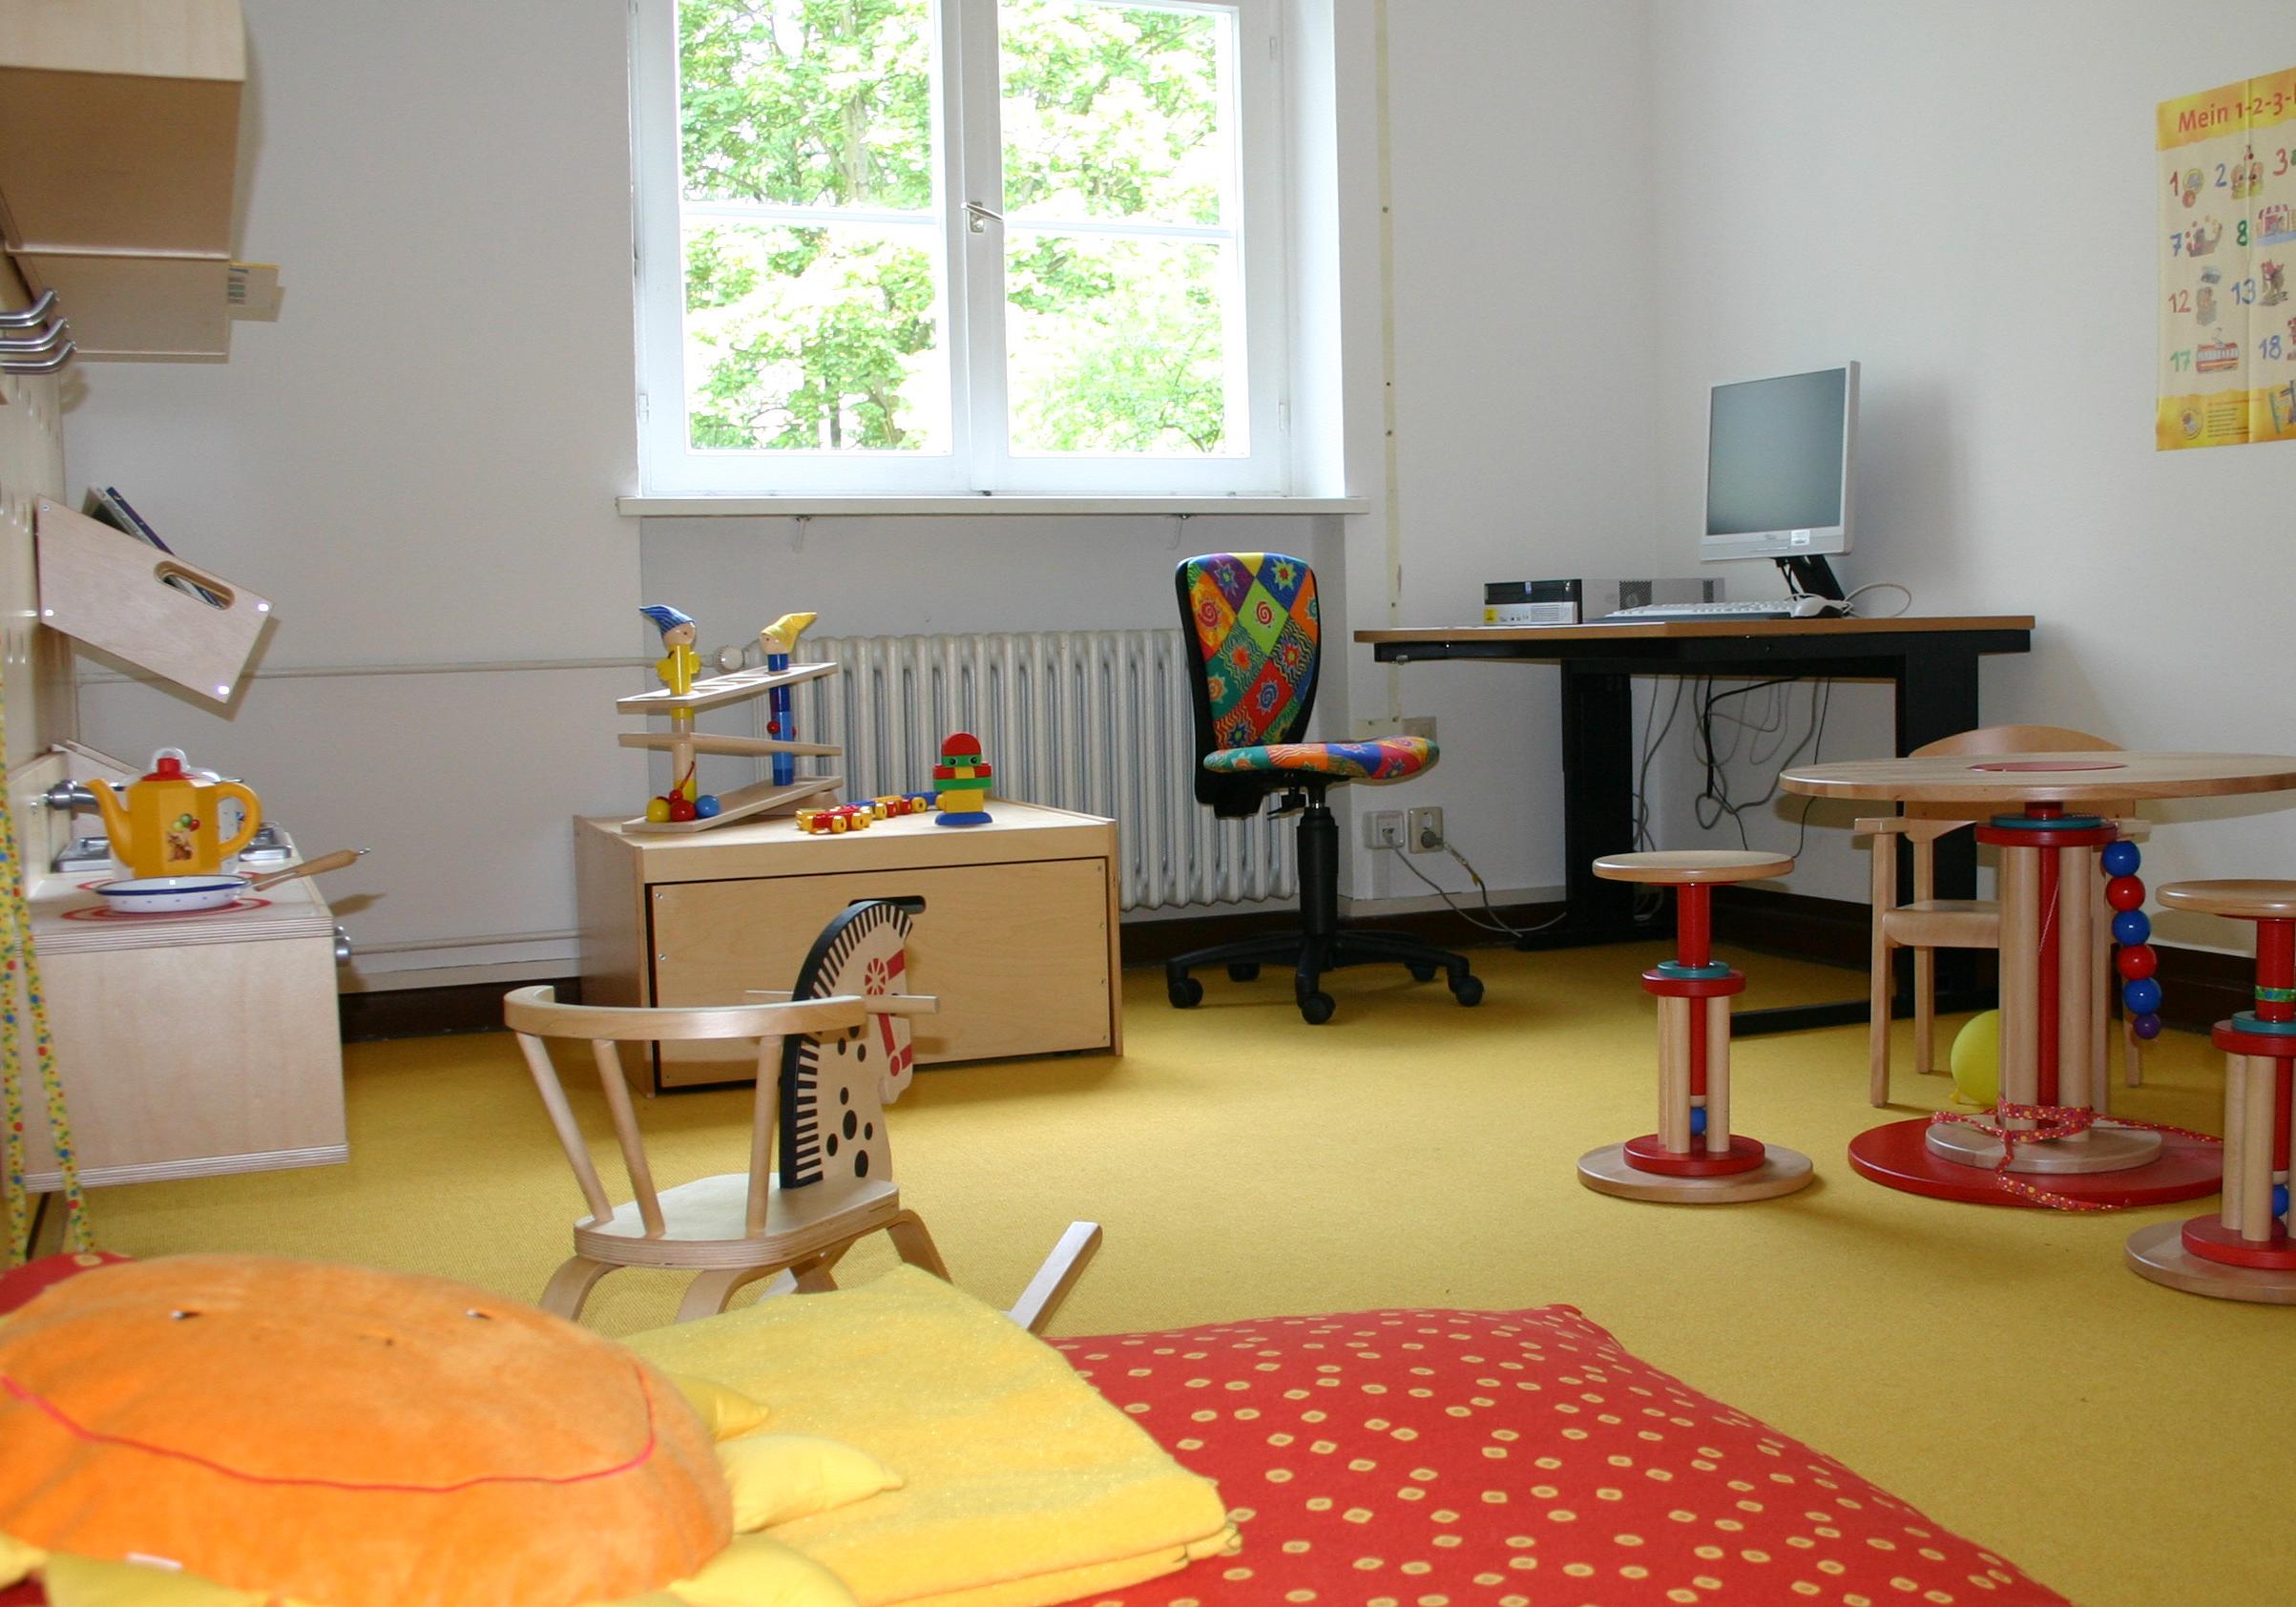 eltern kind arbeitszimmer und kita belegpl tze umweltbundesamt. Black Bedroom Furniture Sets. Home Design Ideas